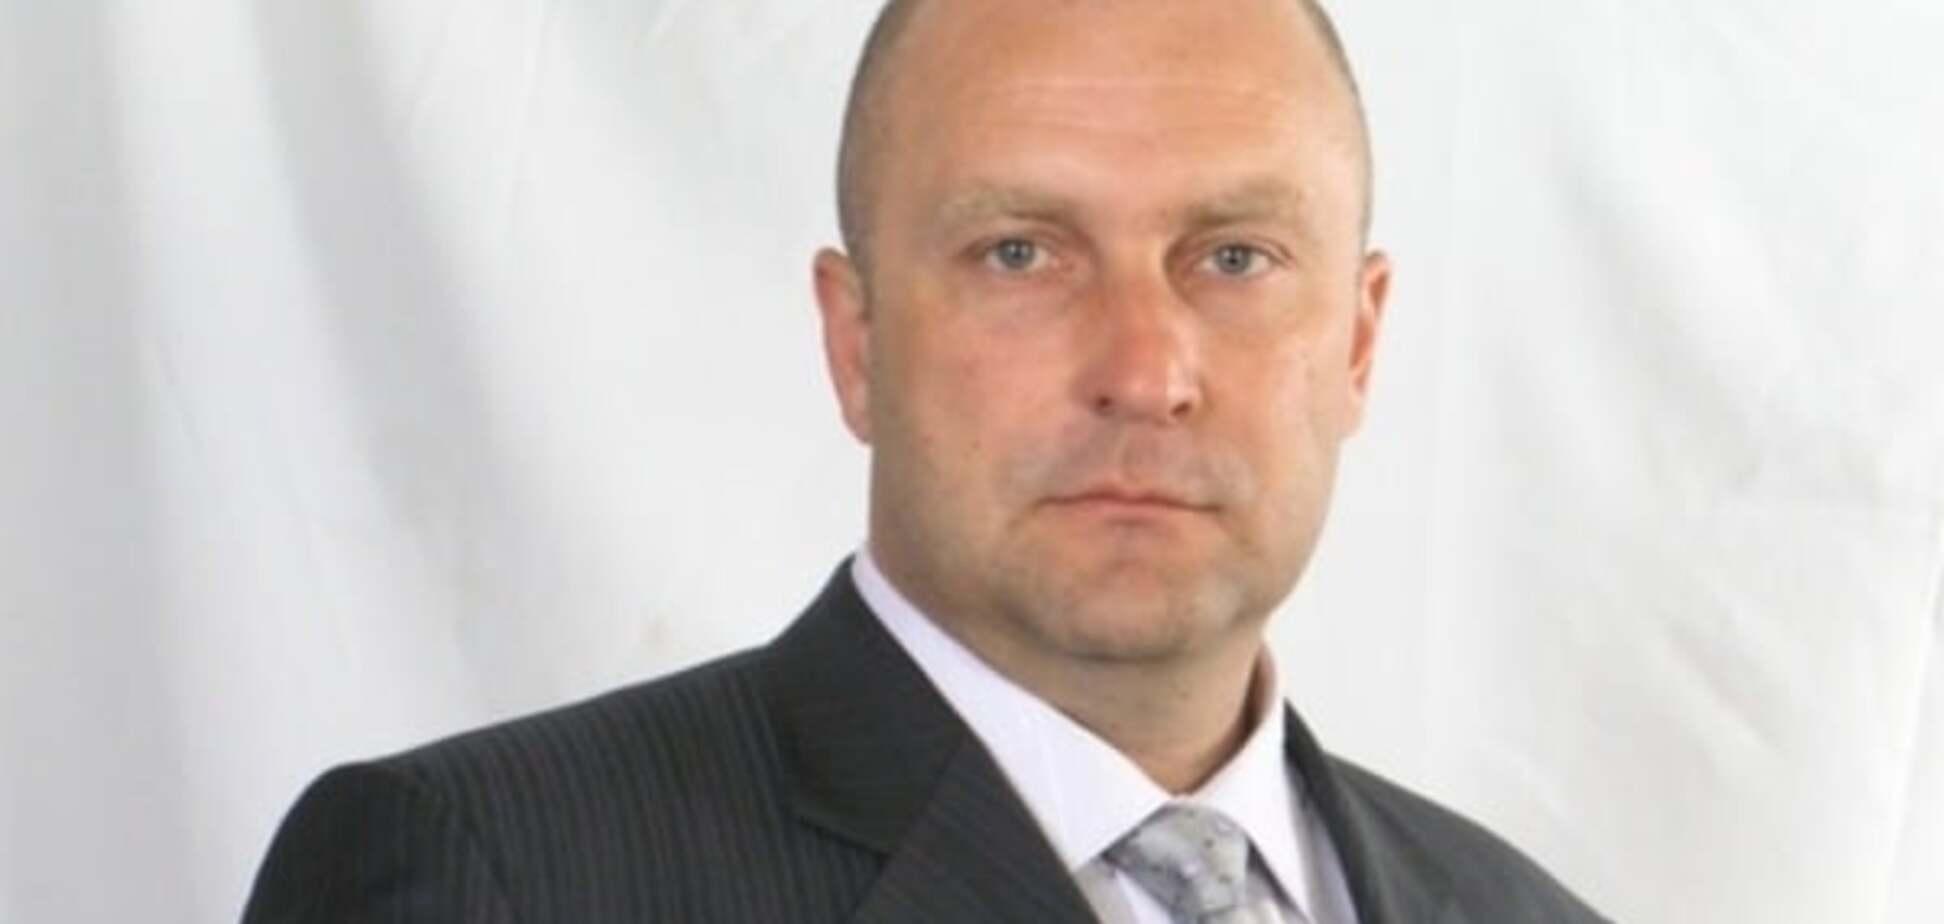 На Донбасі за загадкових обставин помер мер Старобільська